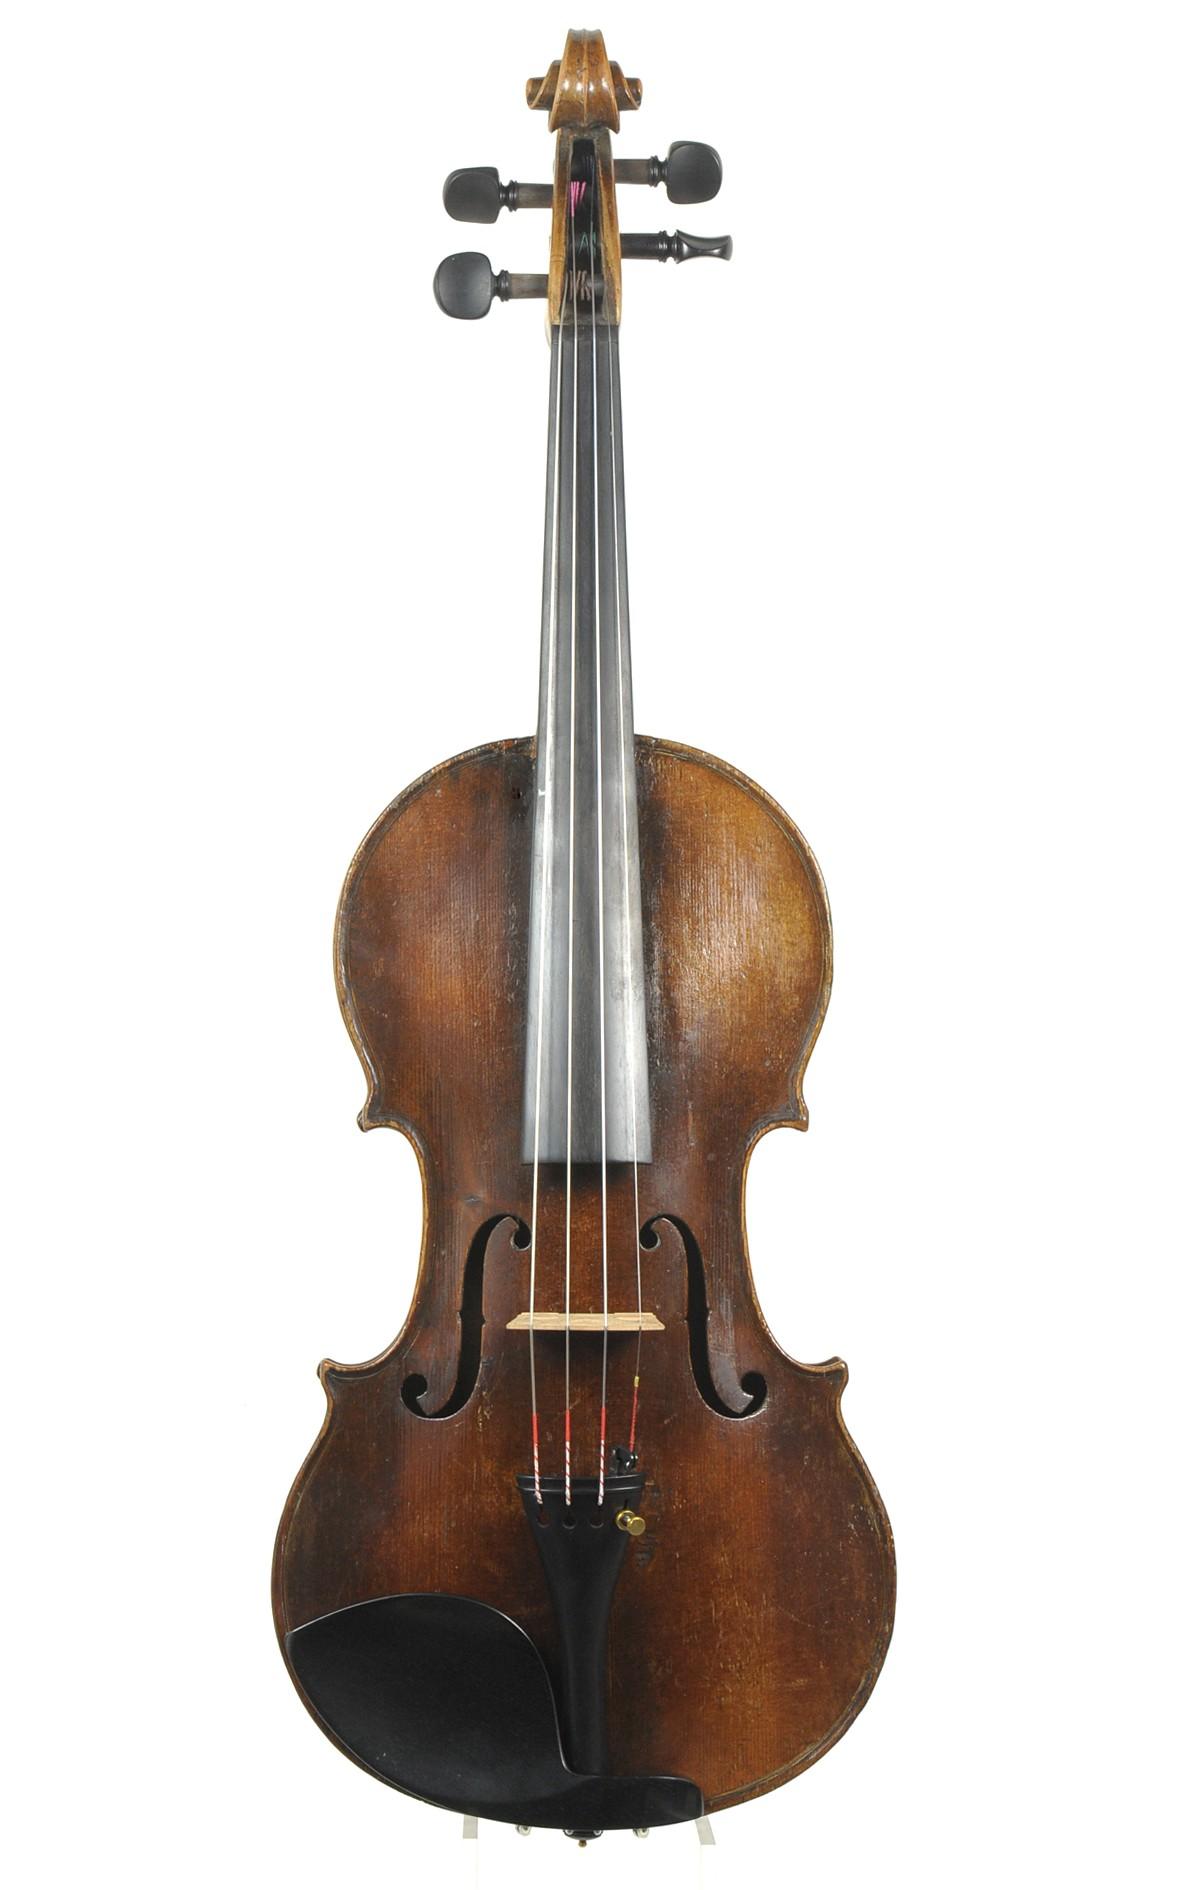 Maline violin approx. 1820